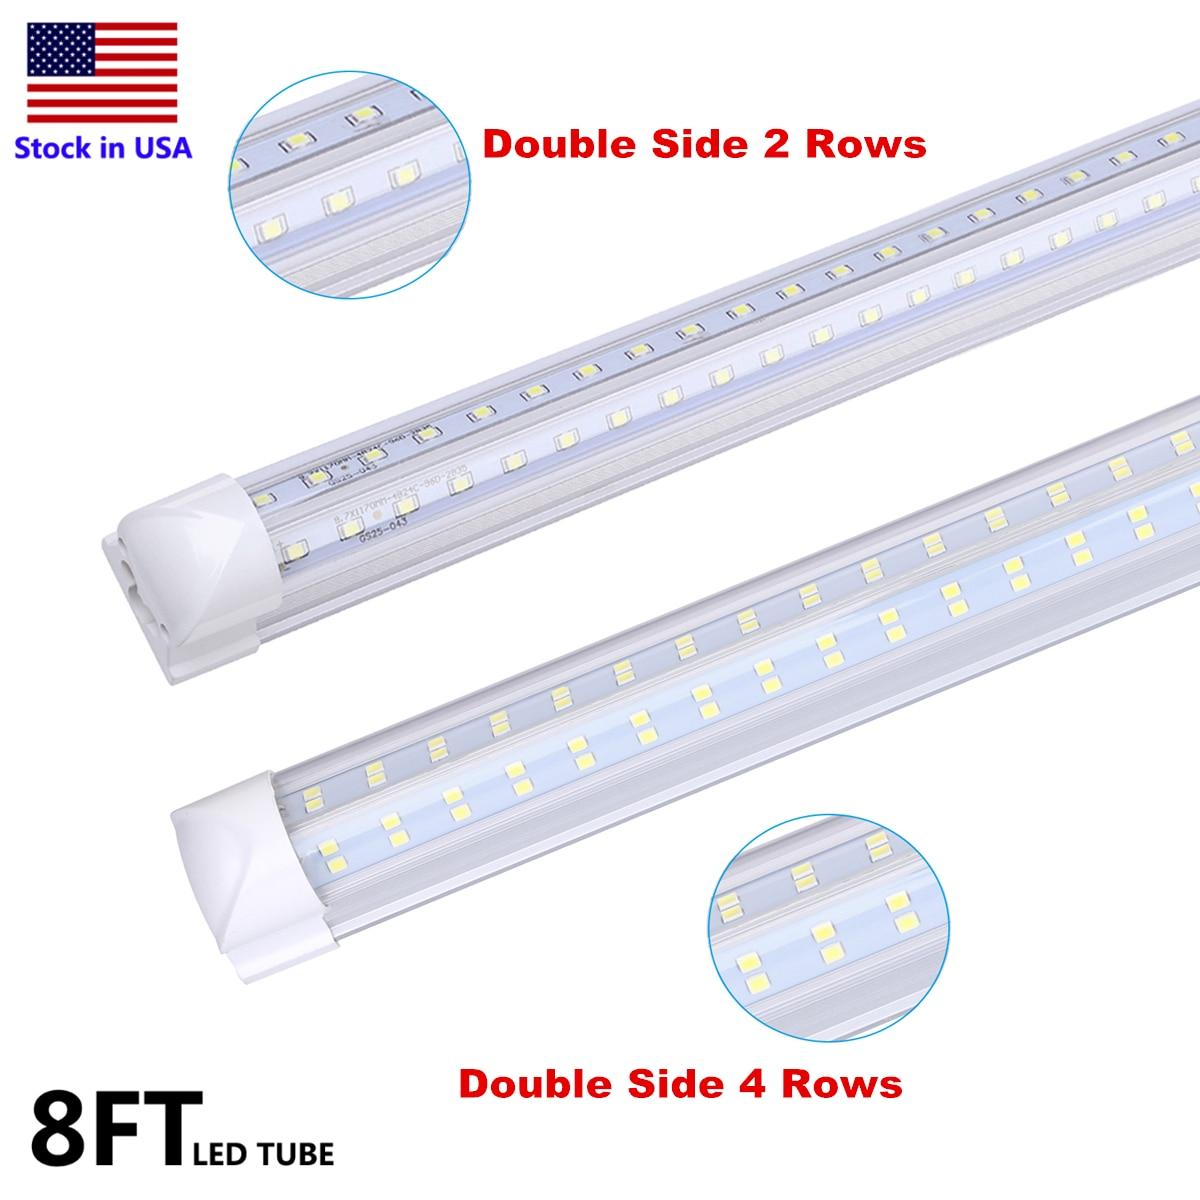 8ft Double Side 4 Rows 120W LED Tube Light Shop Light V-shaped Integrate T8 LED Tube Integrated Cooler Door Stock In US